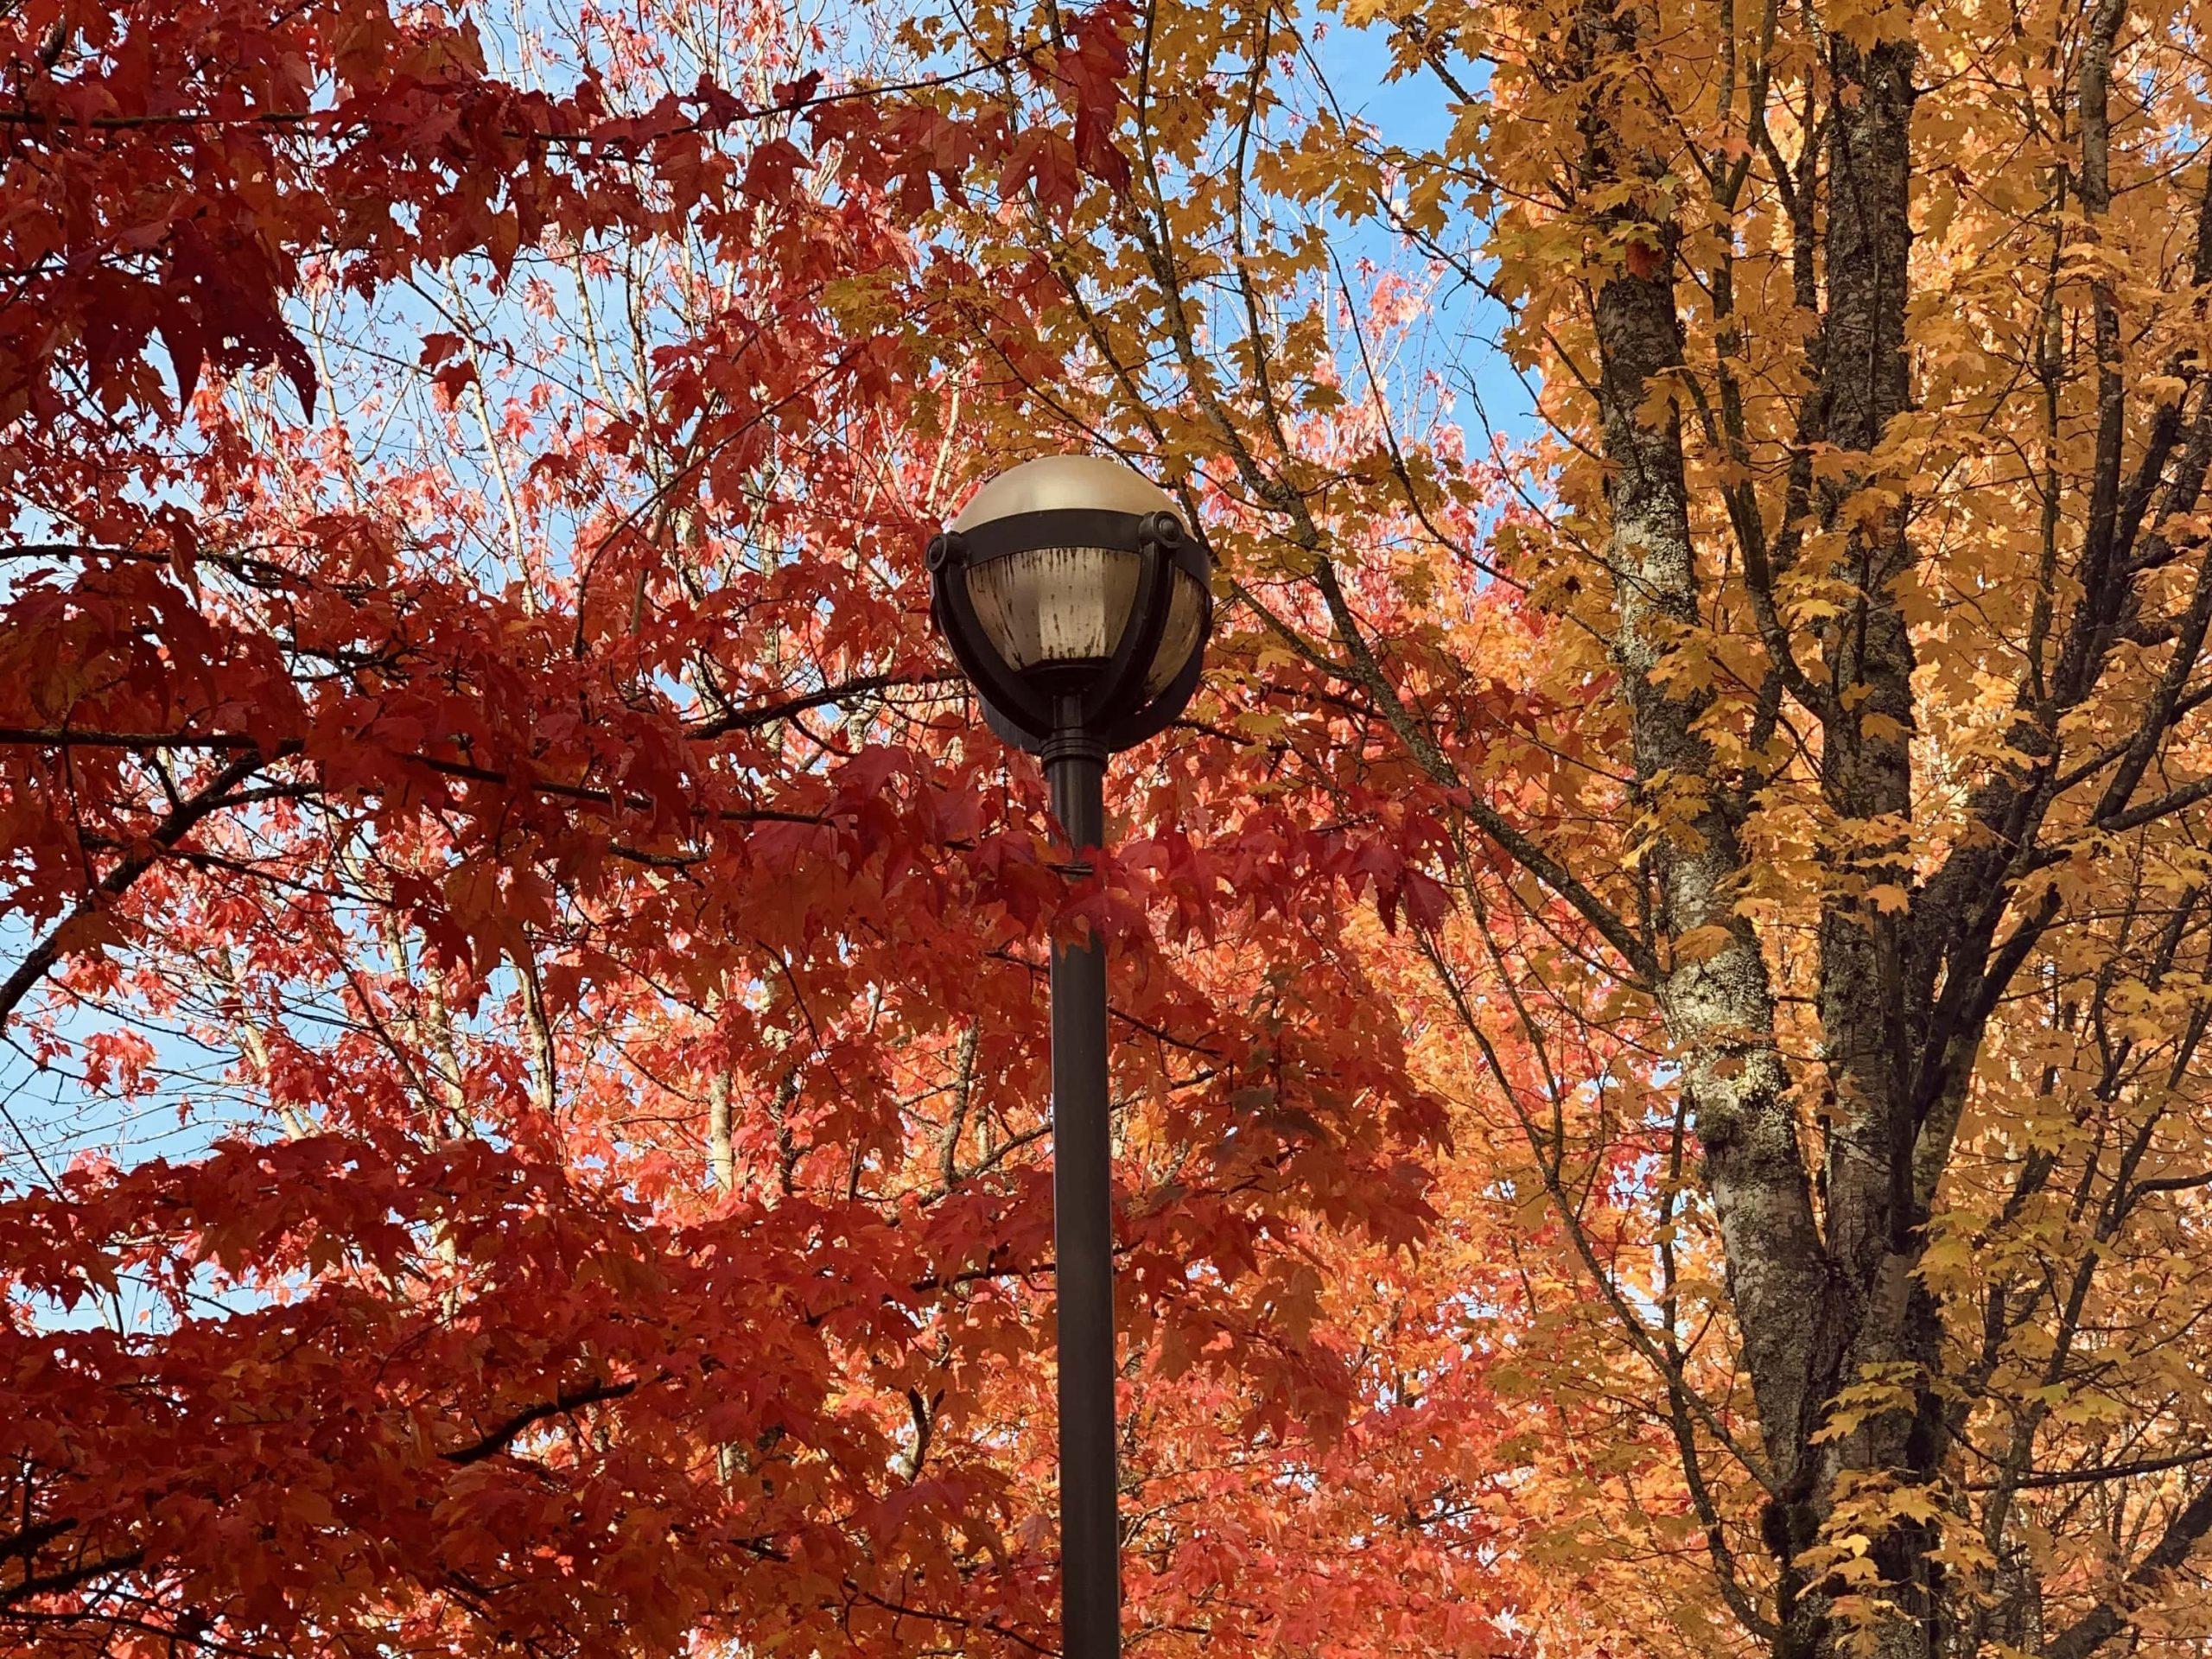 Fall foliage at the University of British Columbia (UBC)